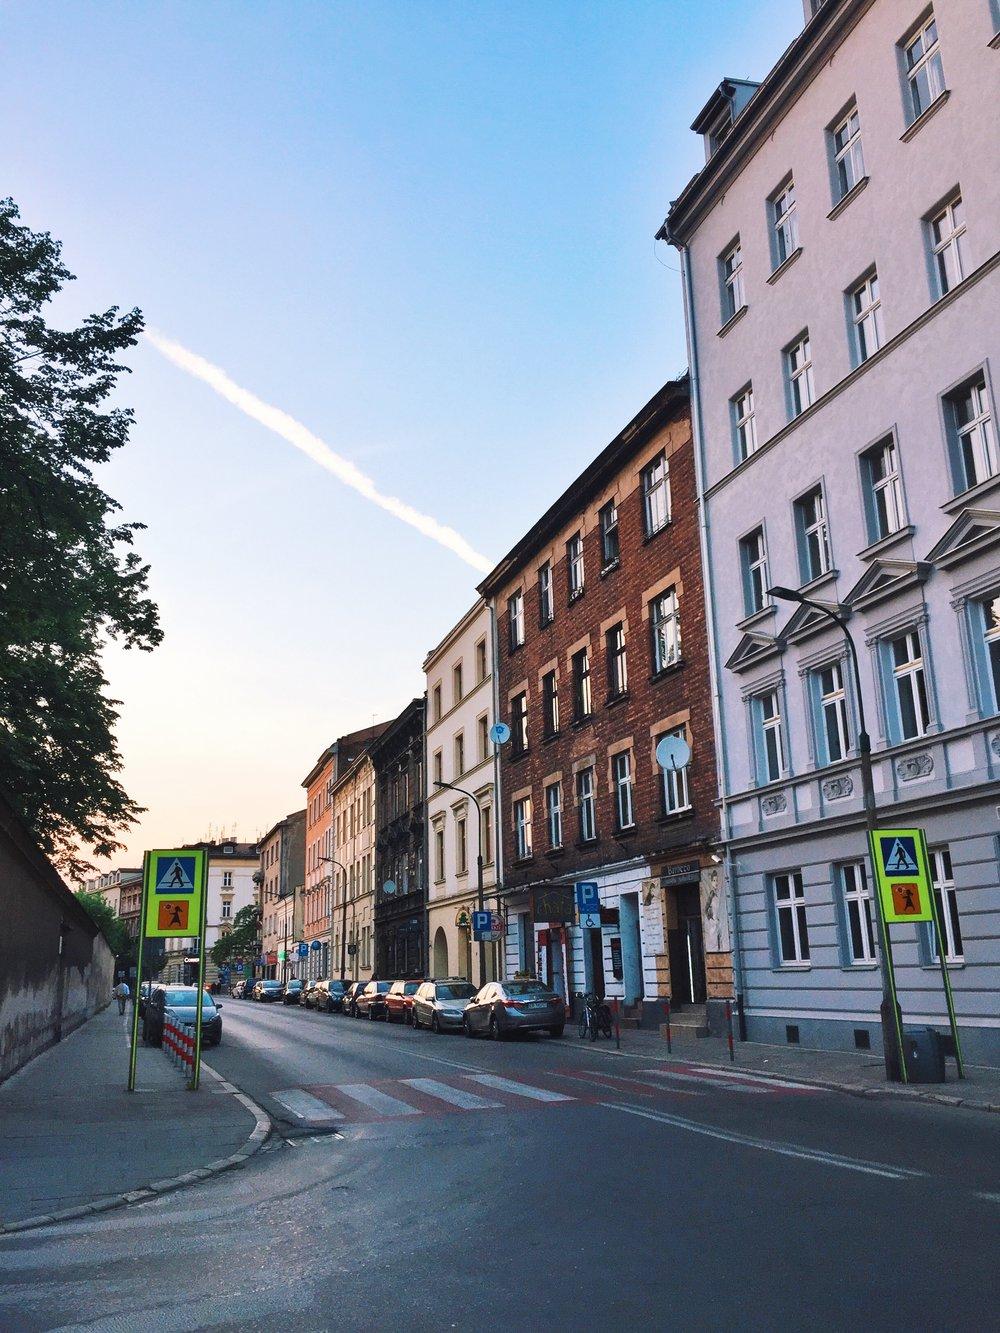 A view of our street, Krowoderska.